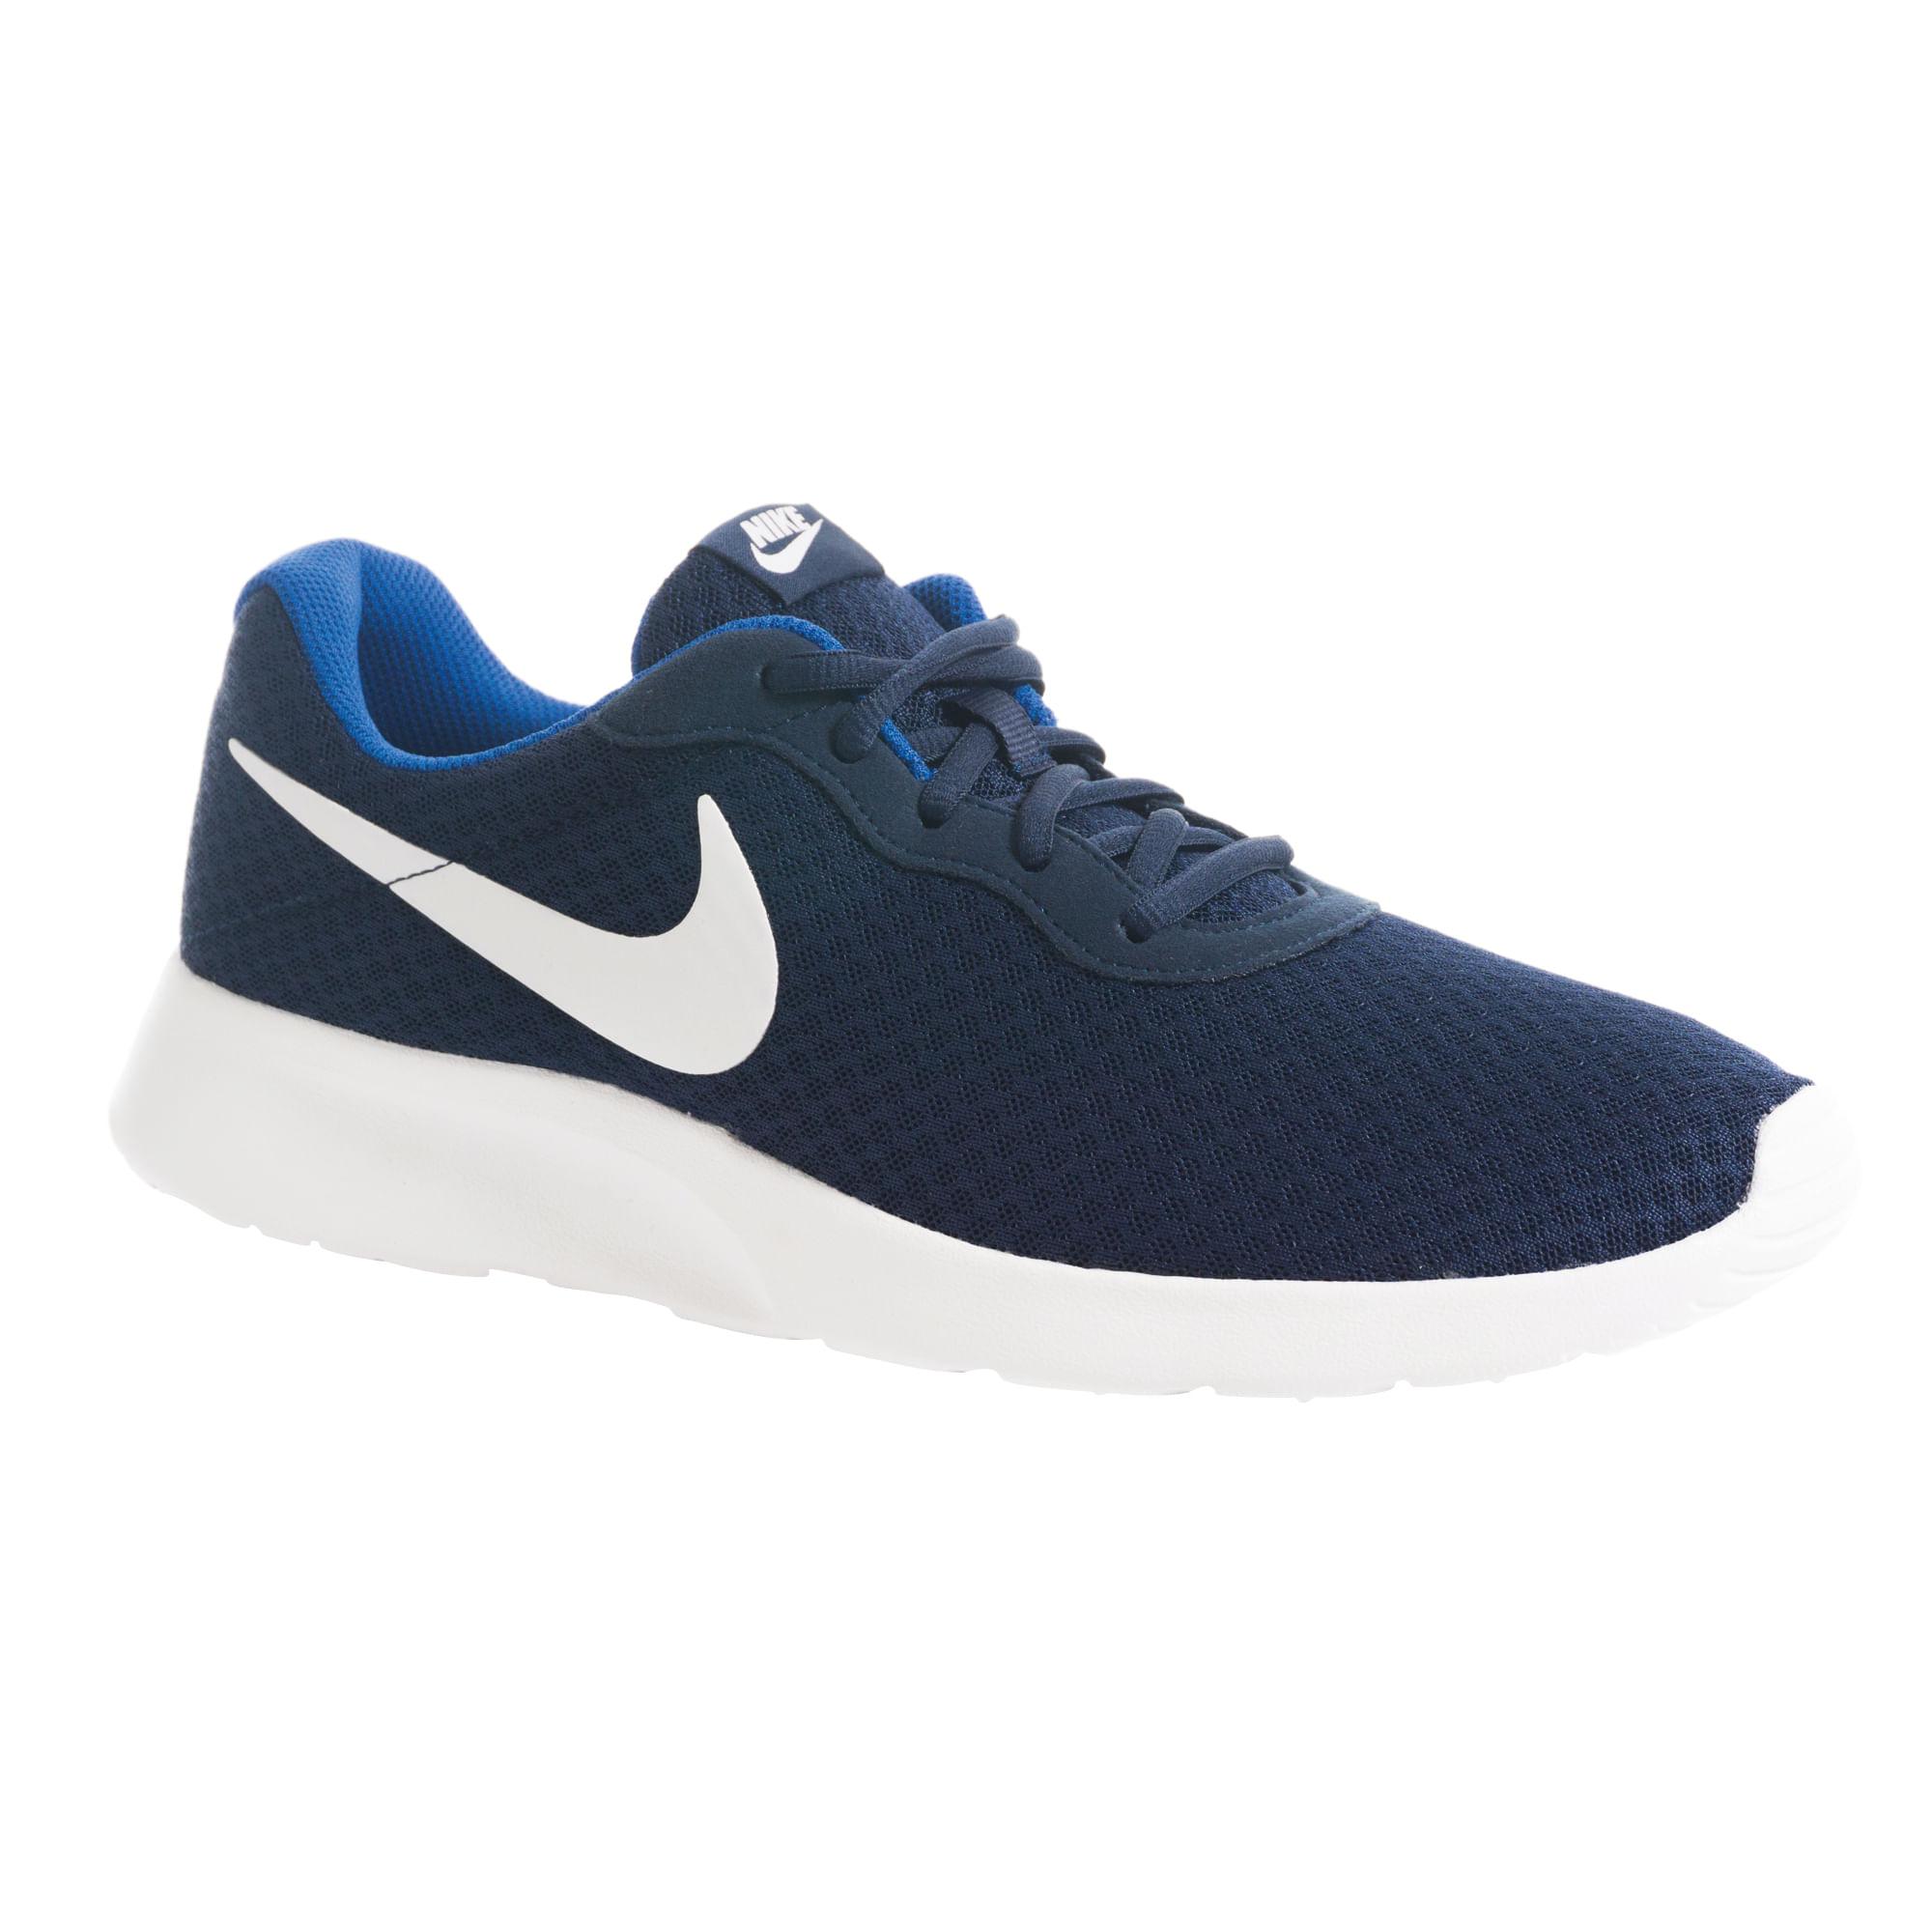 online store 0e9a9 5af0c Nike. TENIS NIKE TANJUN HOMBRE